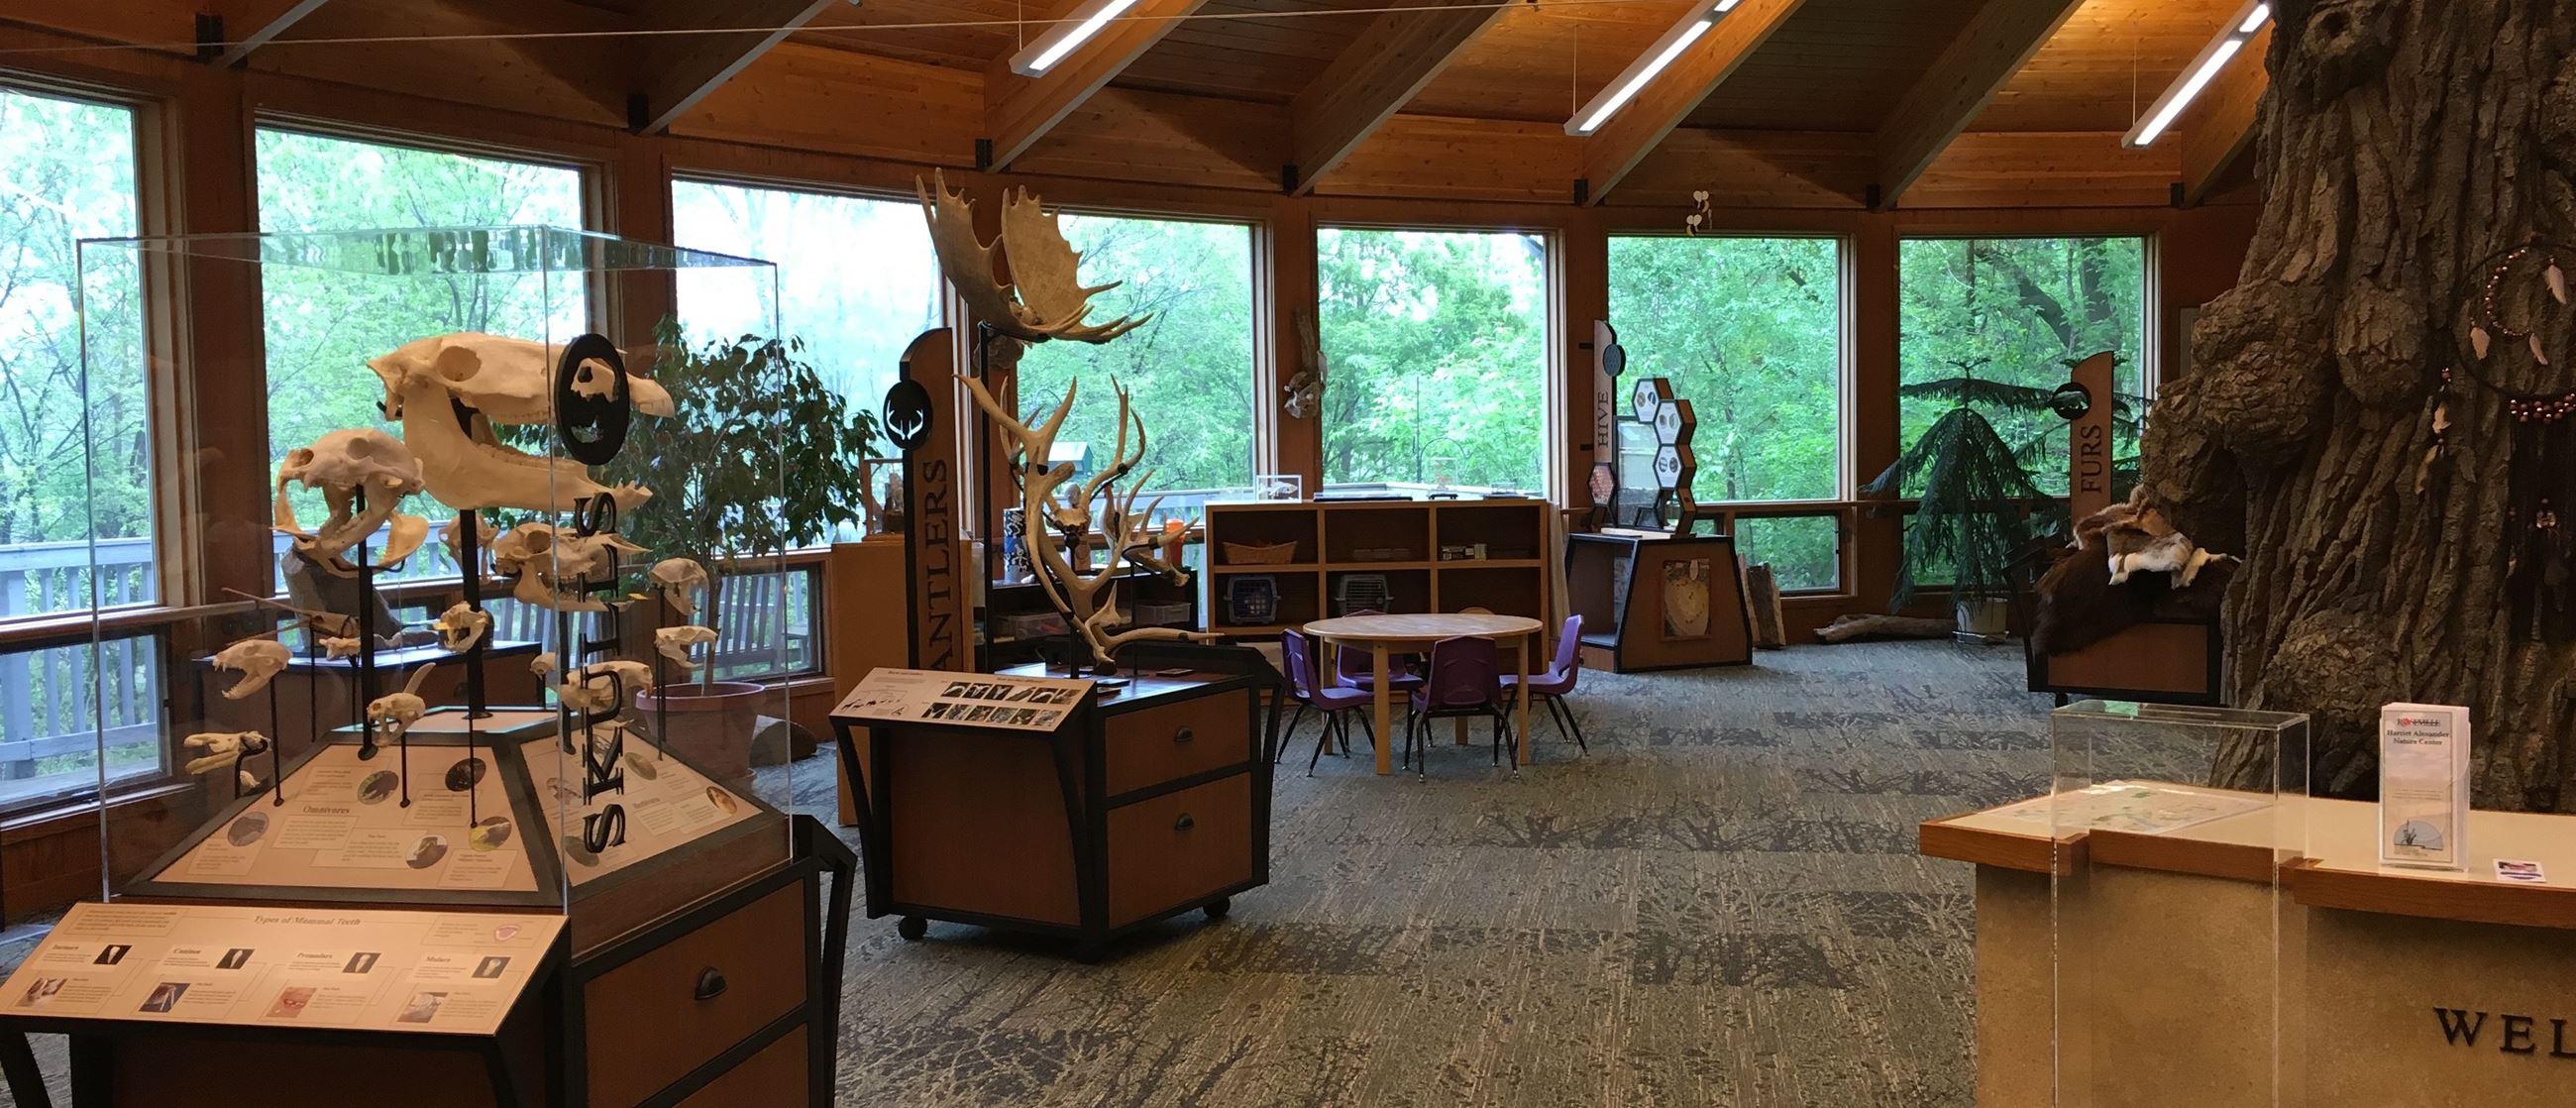 Harriet Alexander Nature Center